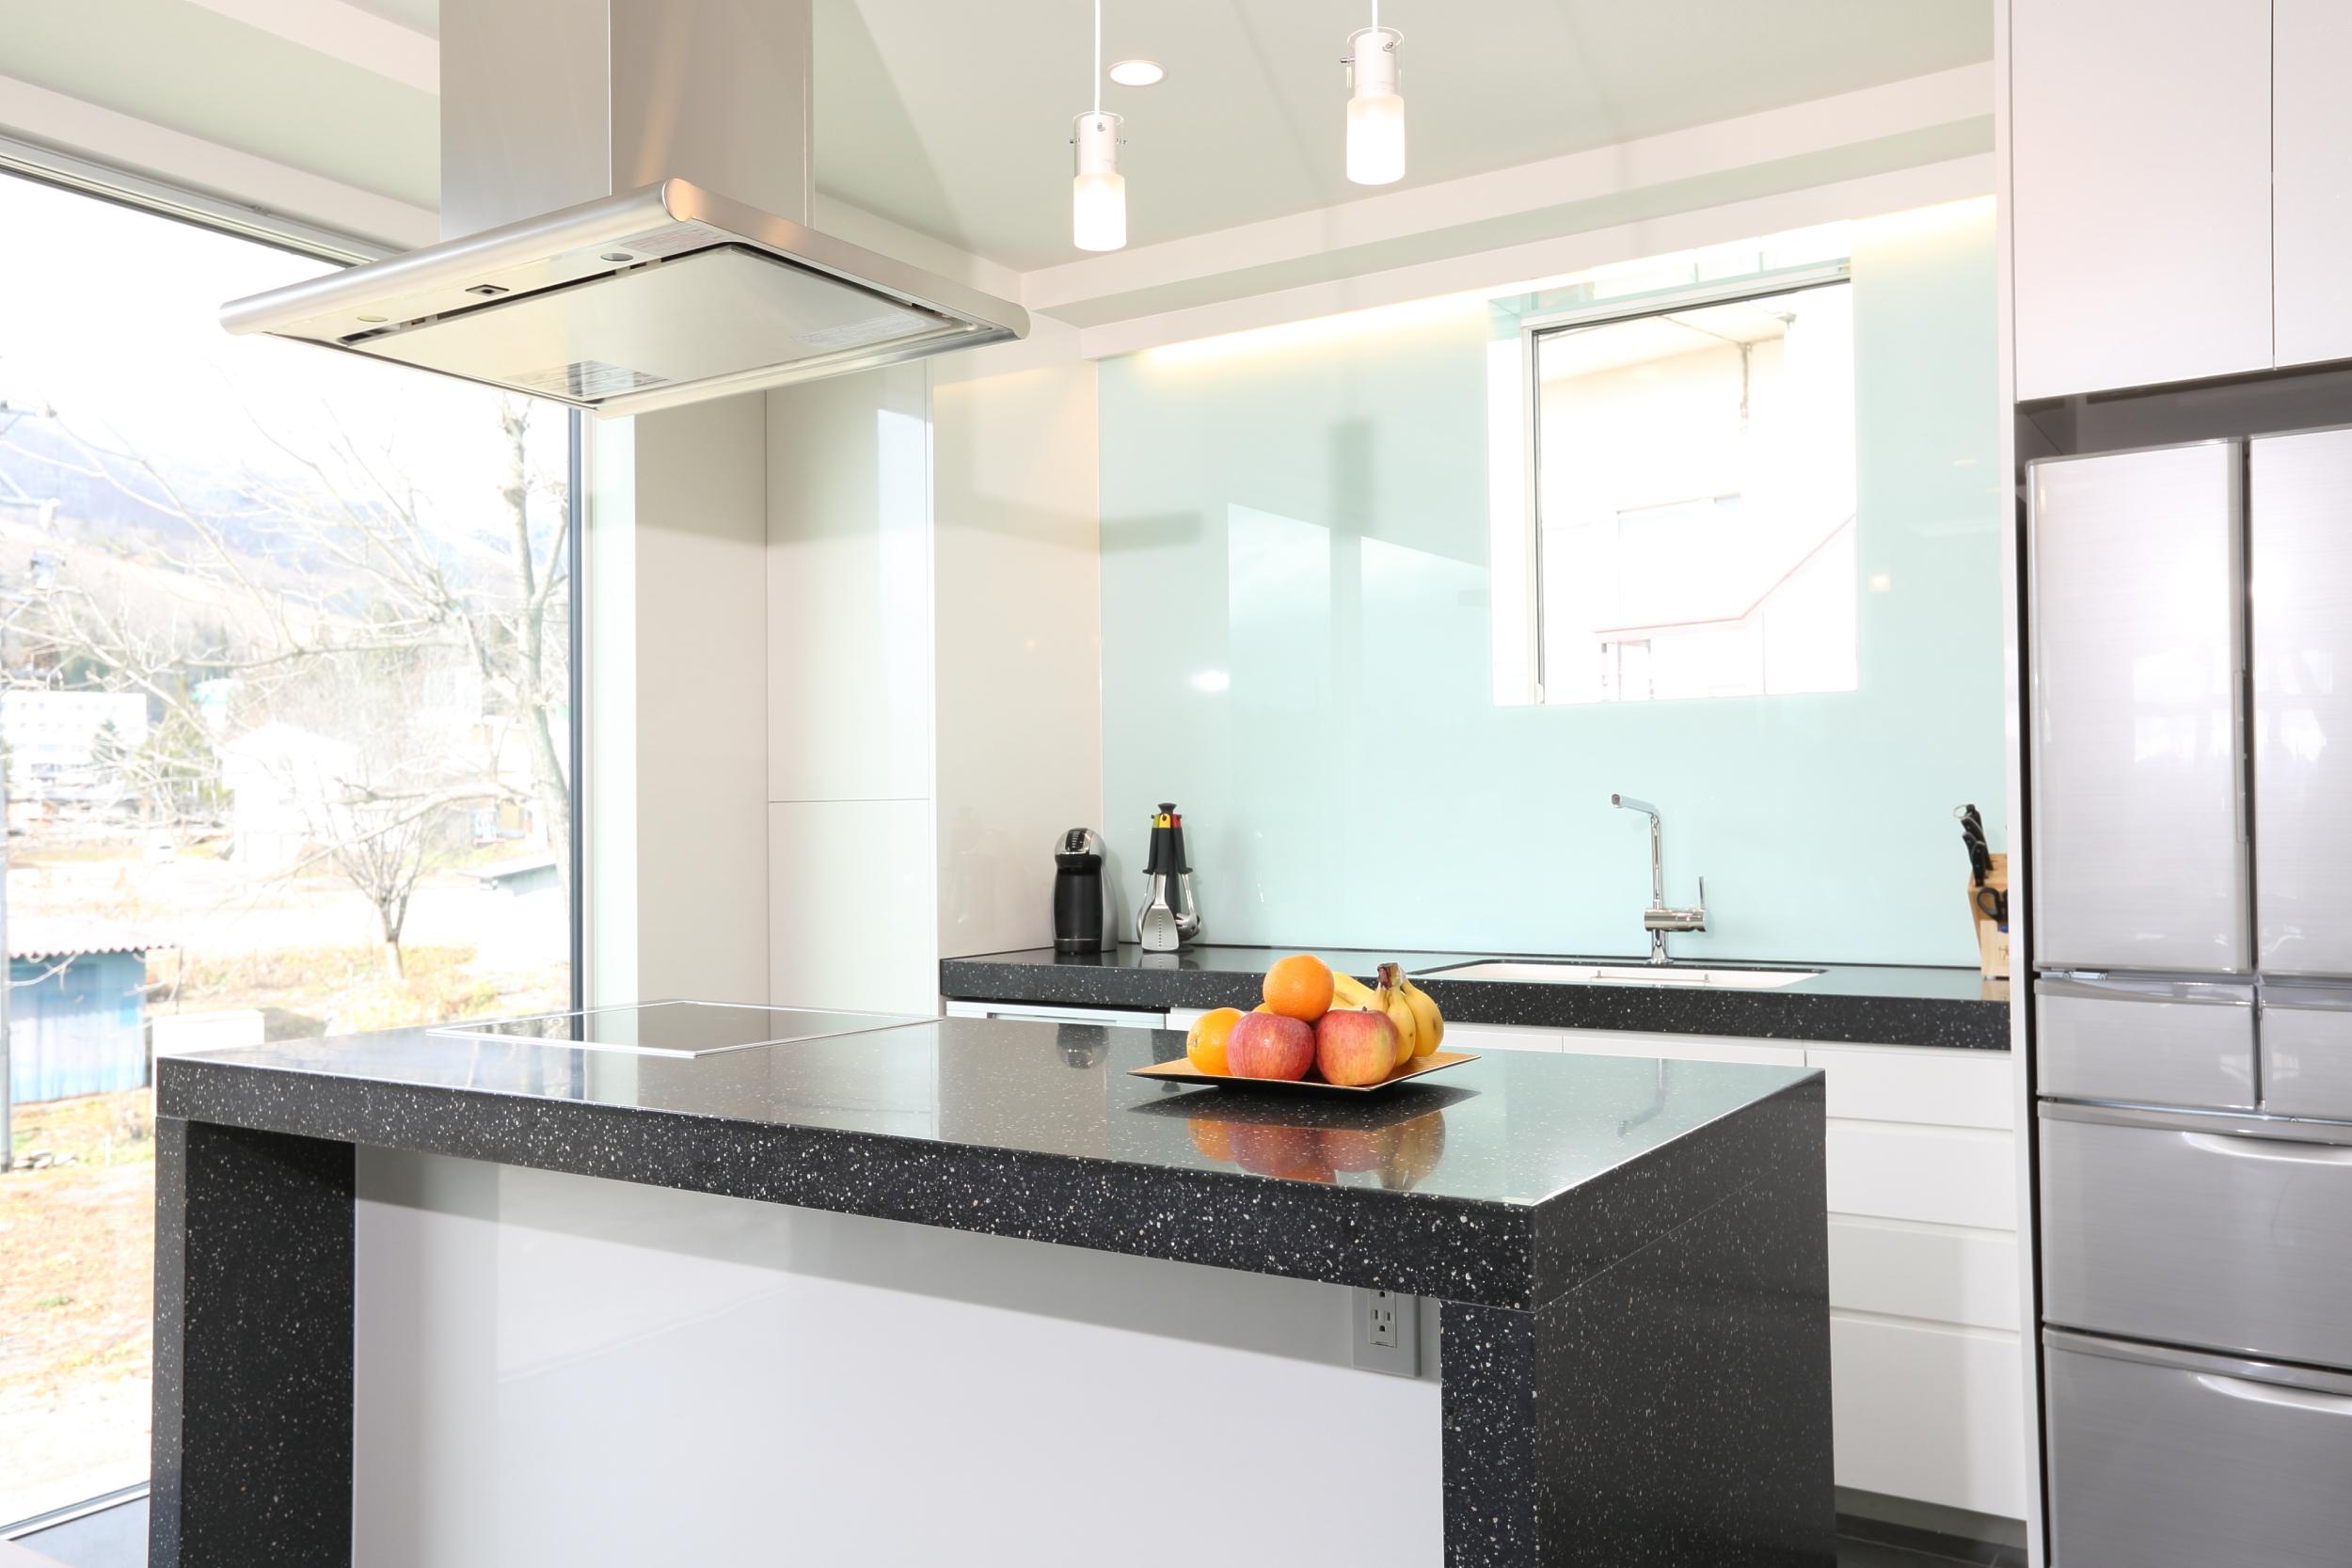 bluebird apartments kitchen.jpg